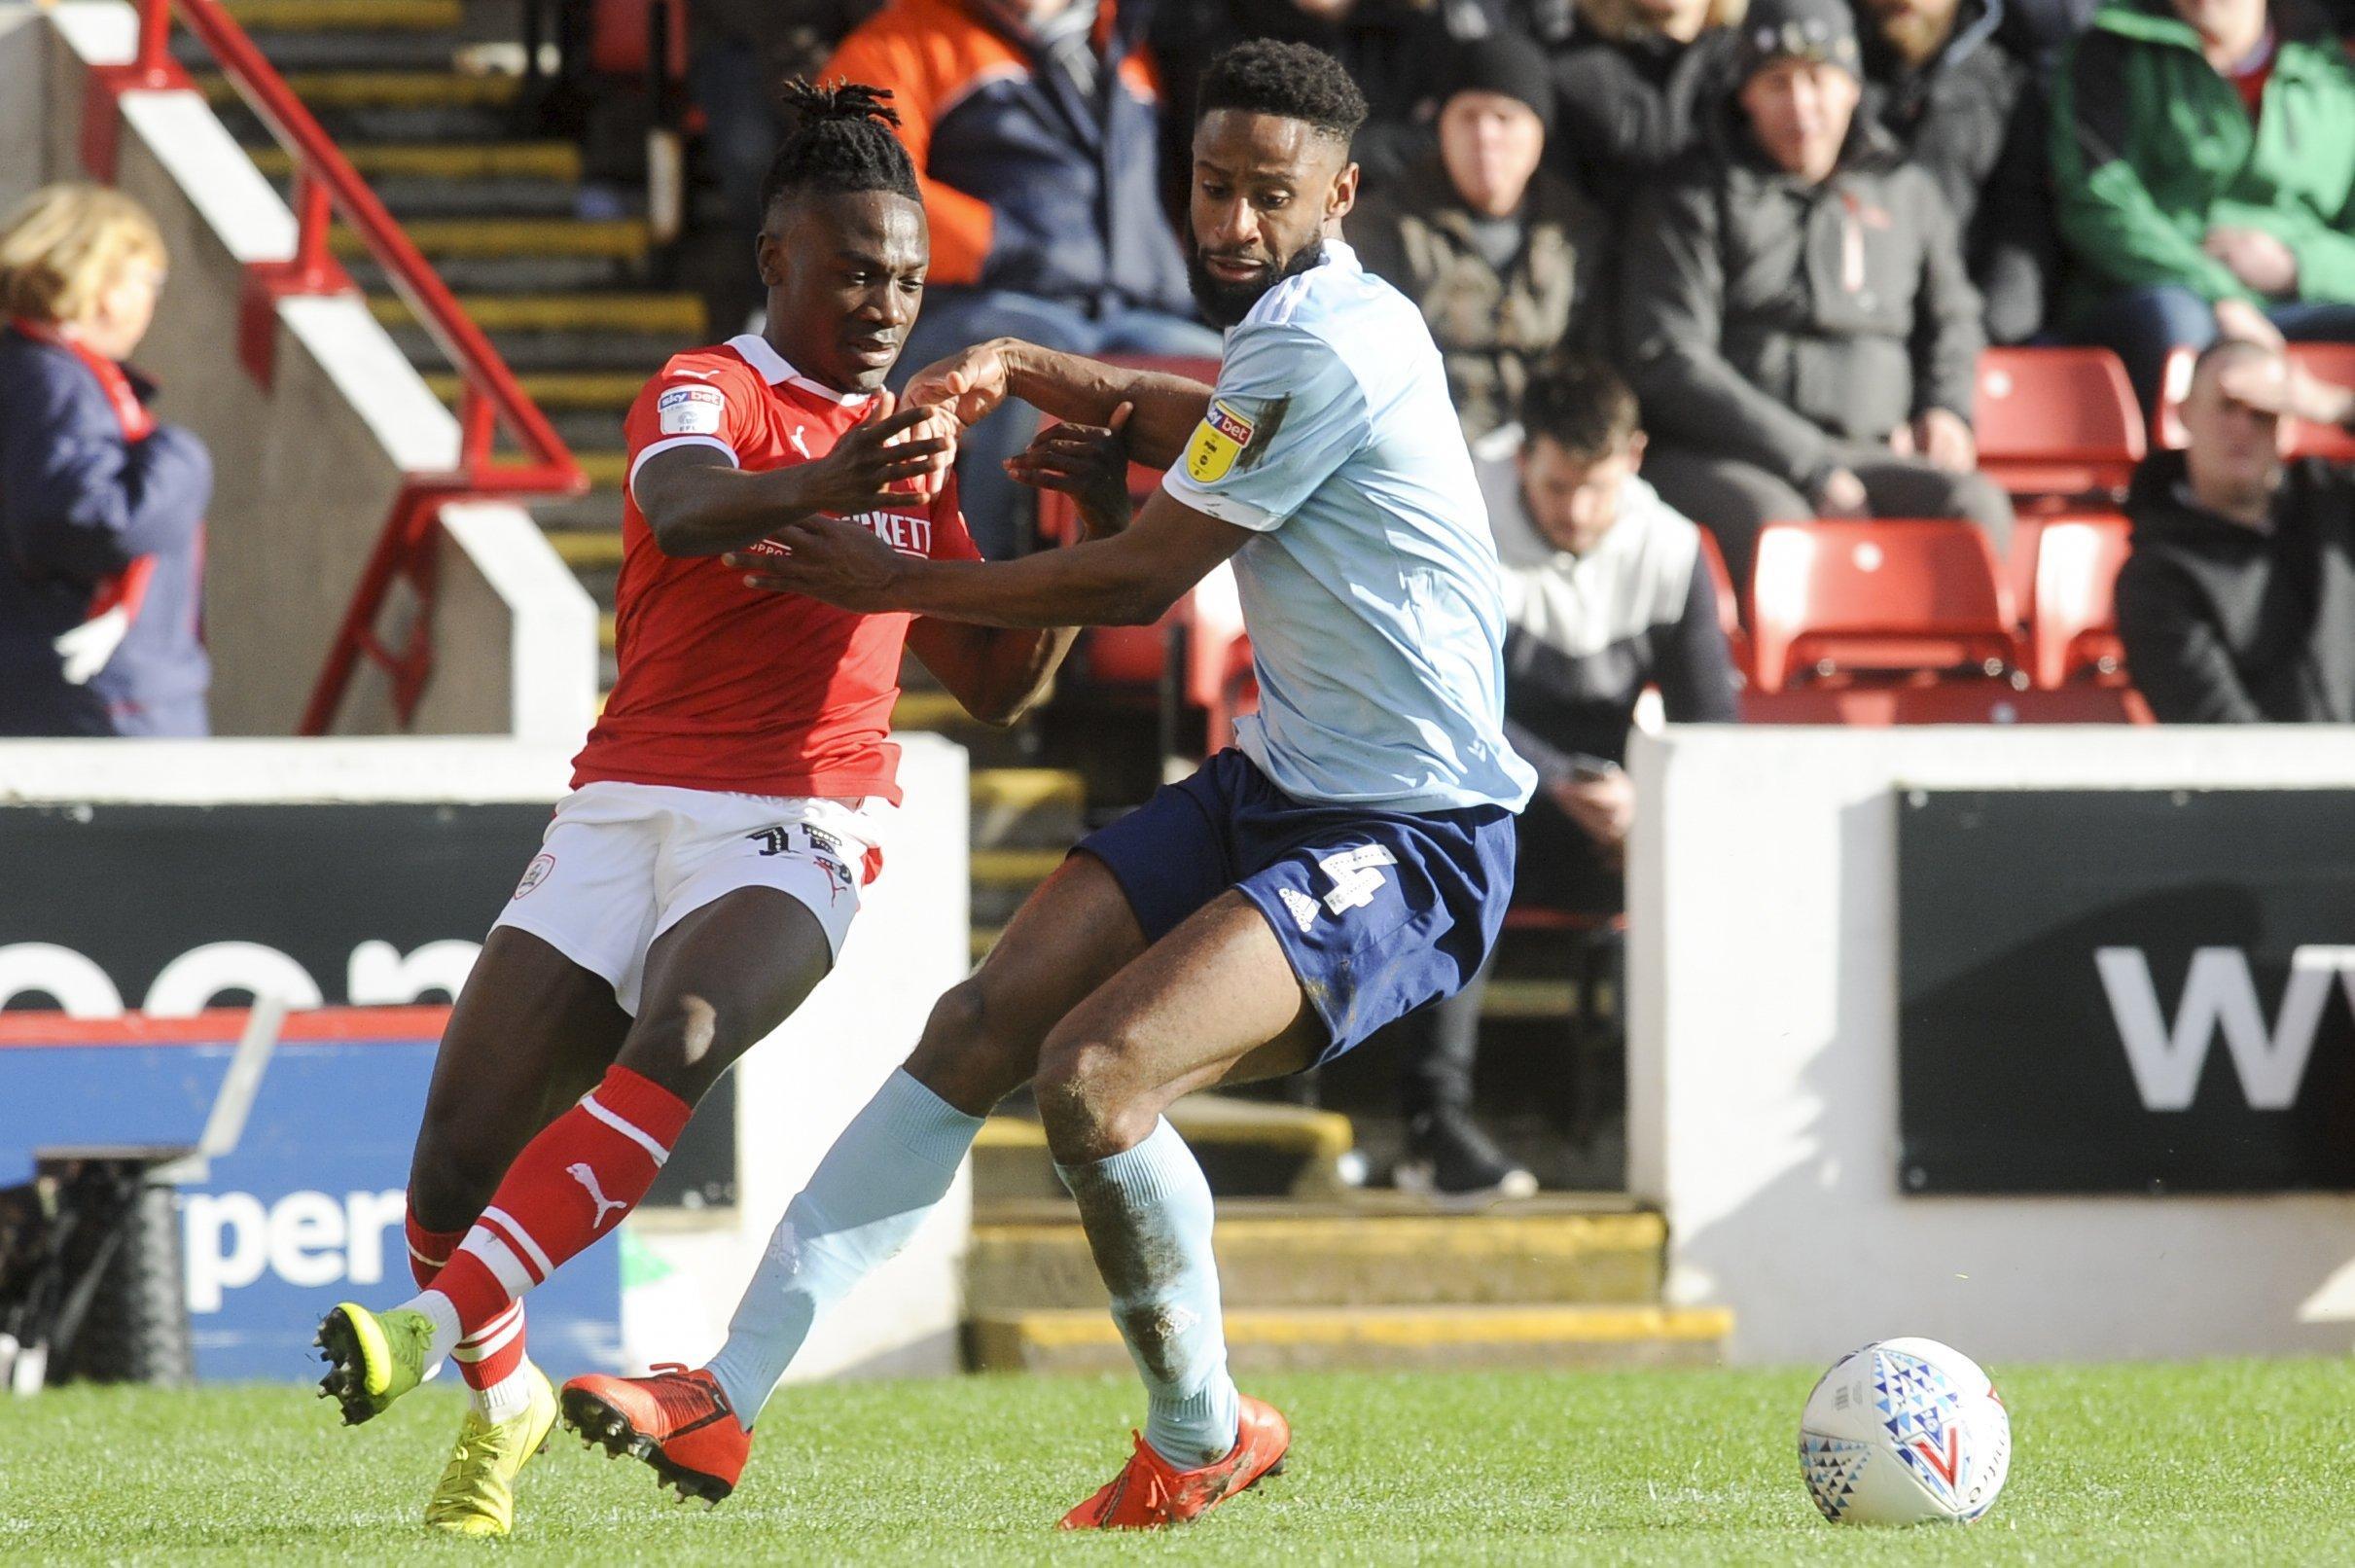 Barnsley: Jordan Green calls for bravery after Luton defeat